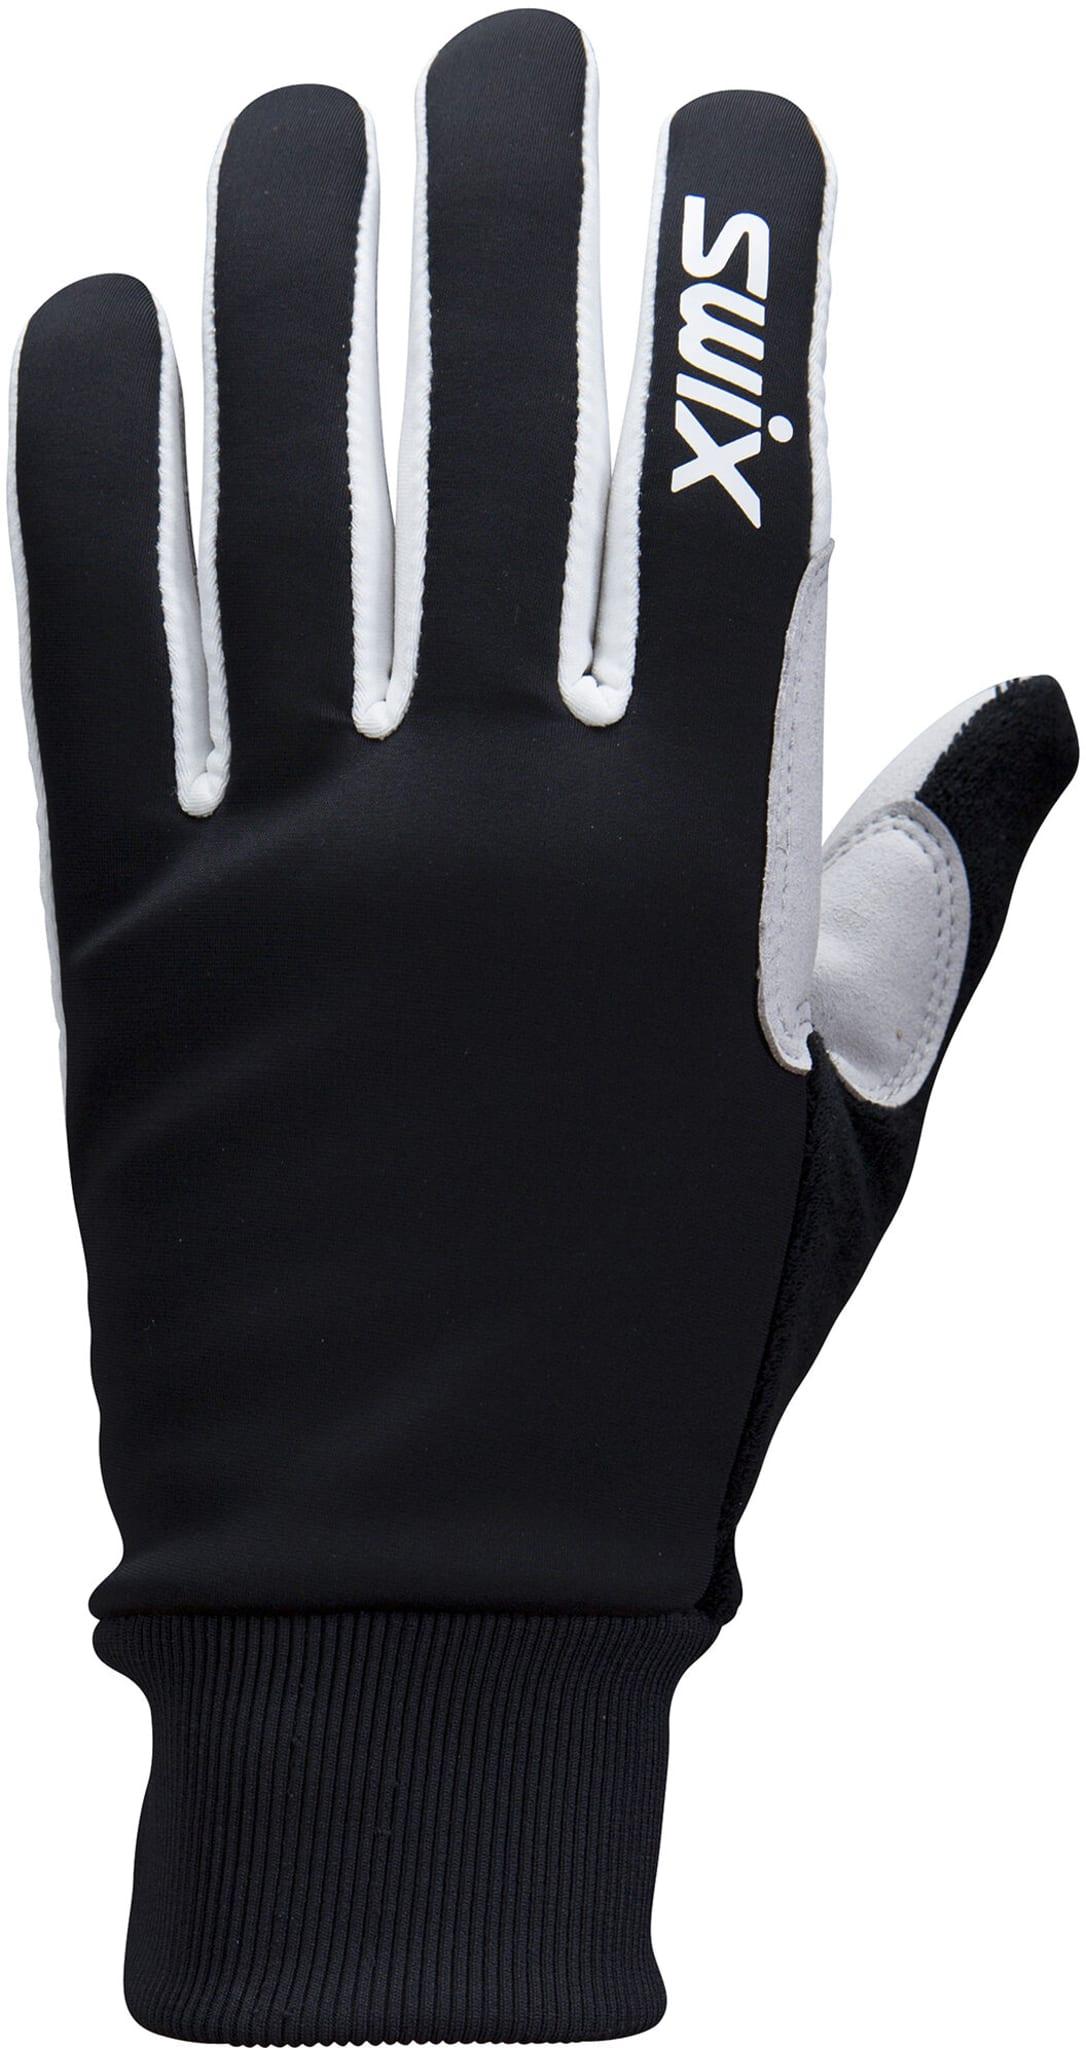 Tracx Glove